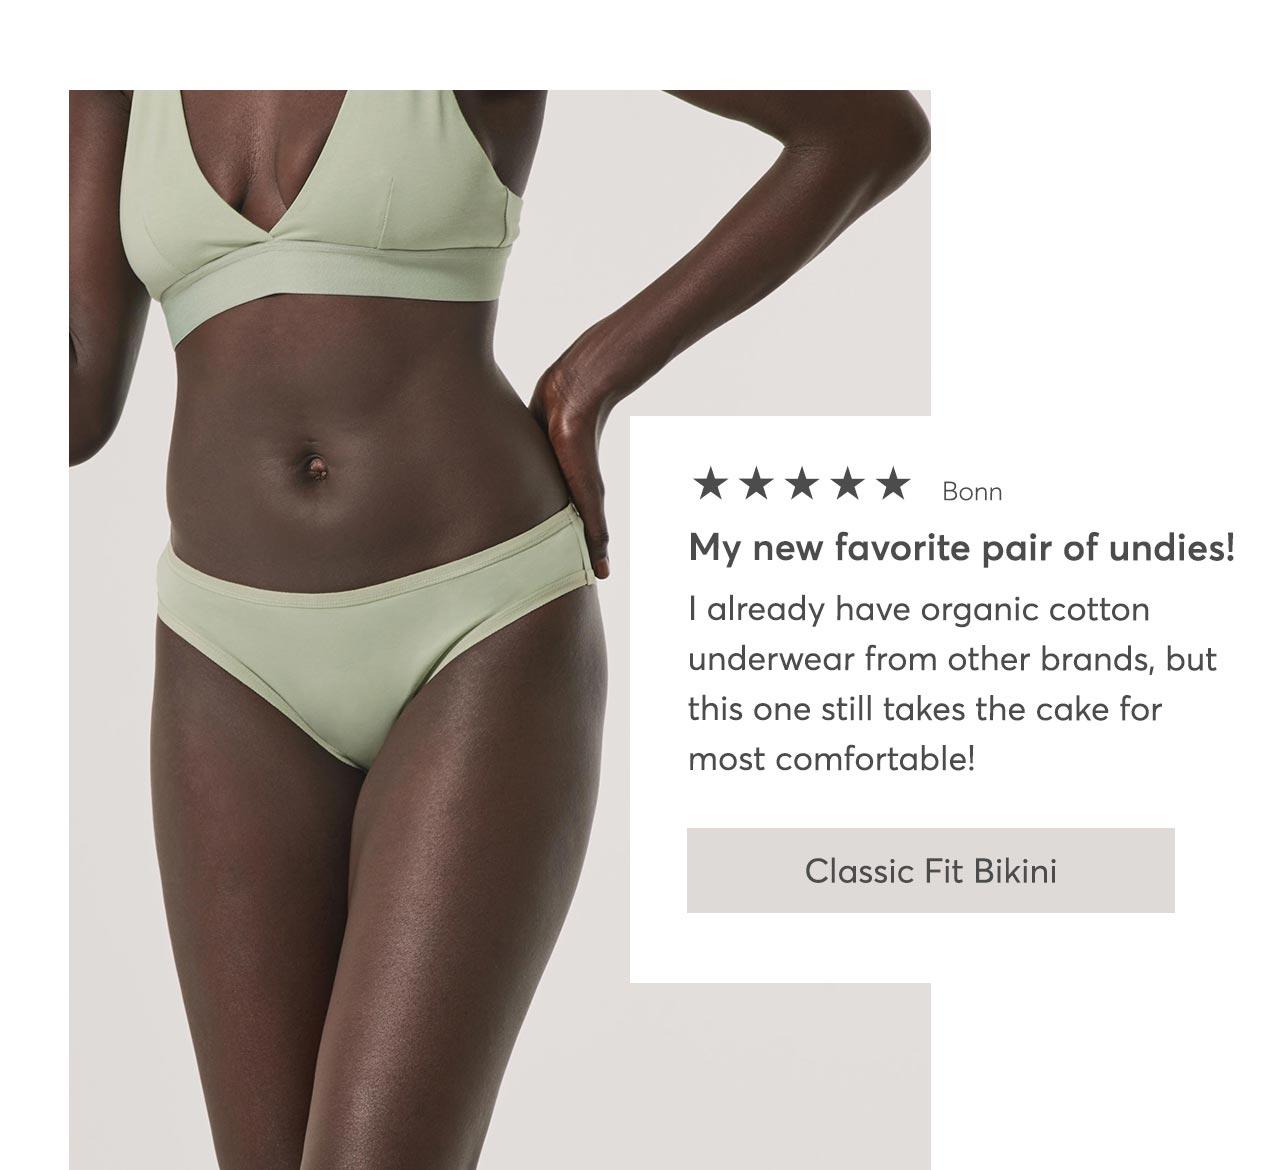 Classic Fit Bikini